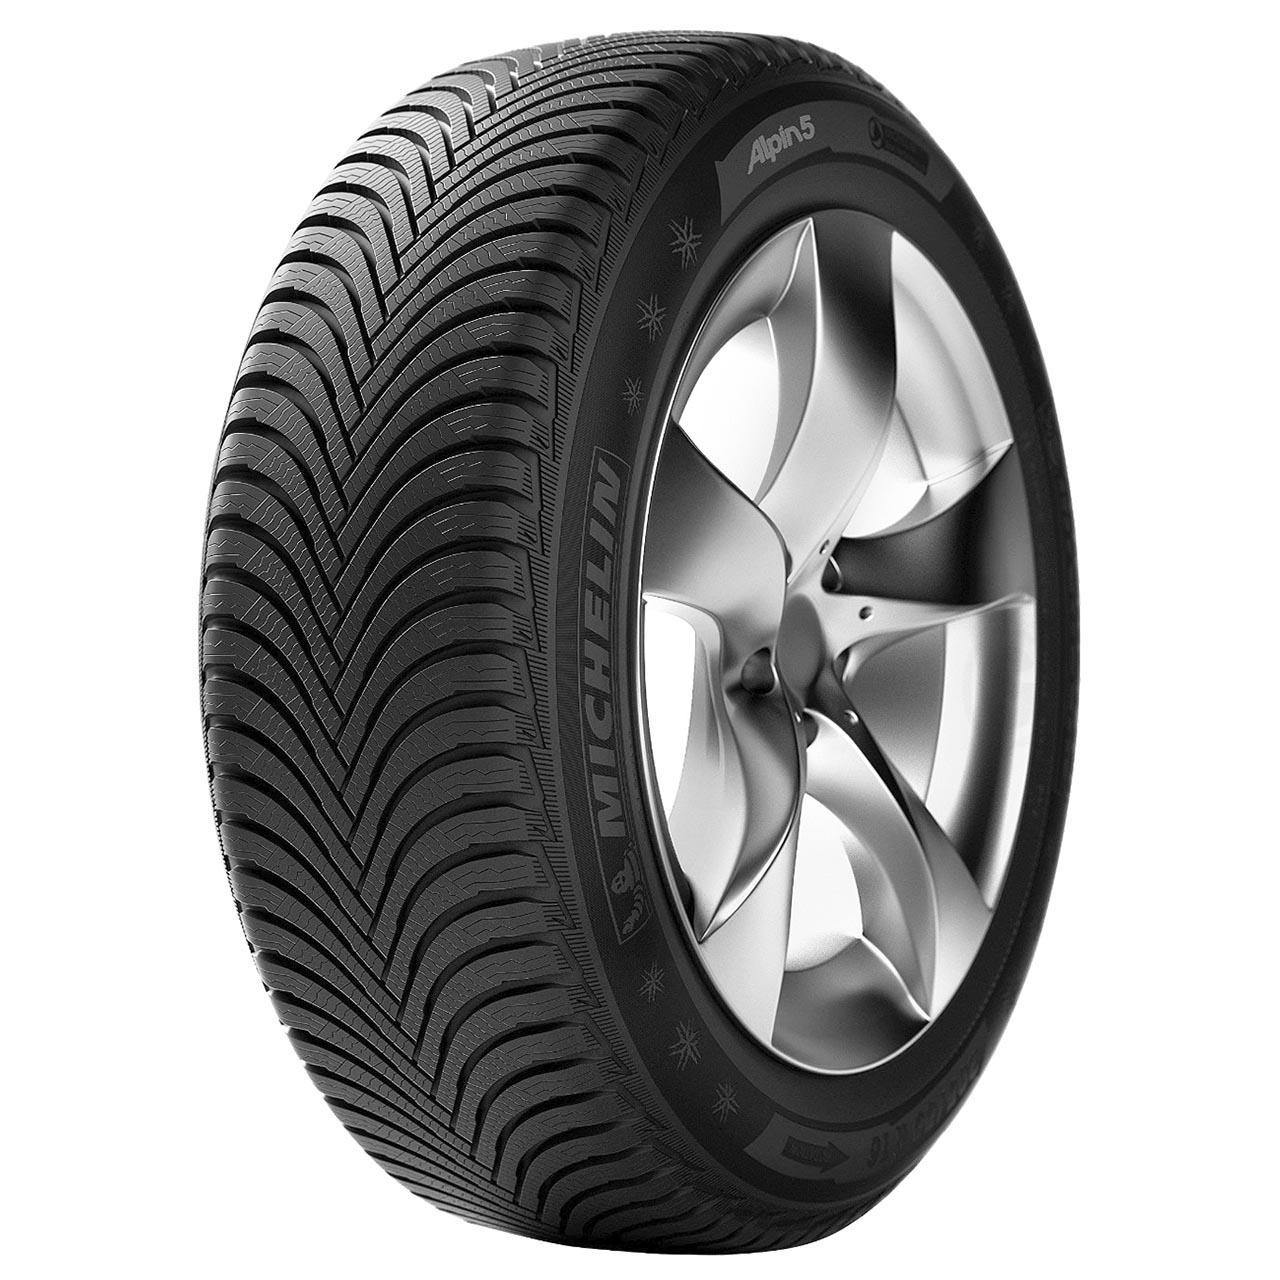 Michelin Pilot Alpin 5 235/55R17 103V EL